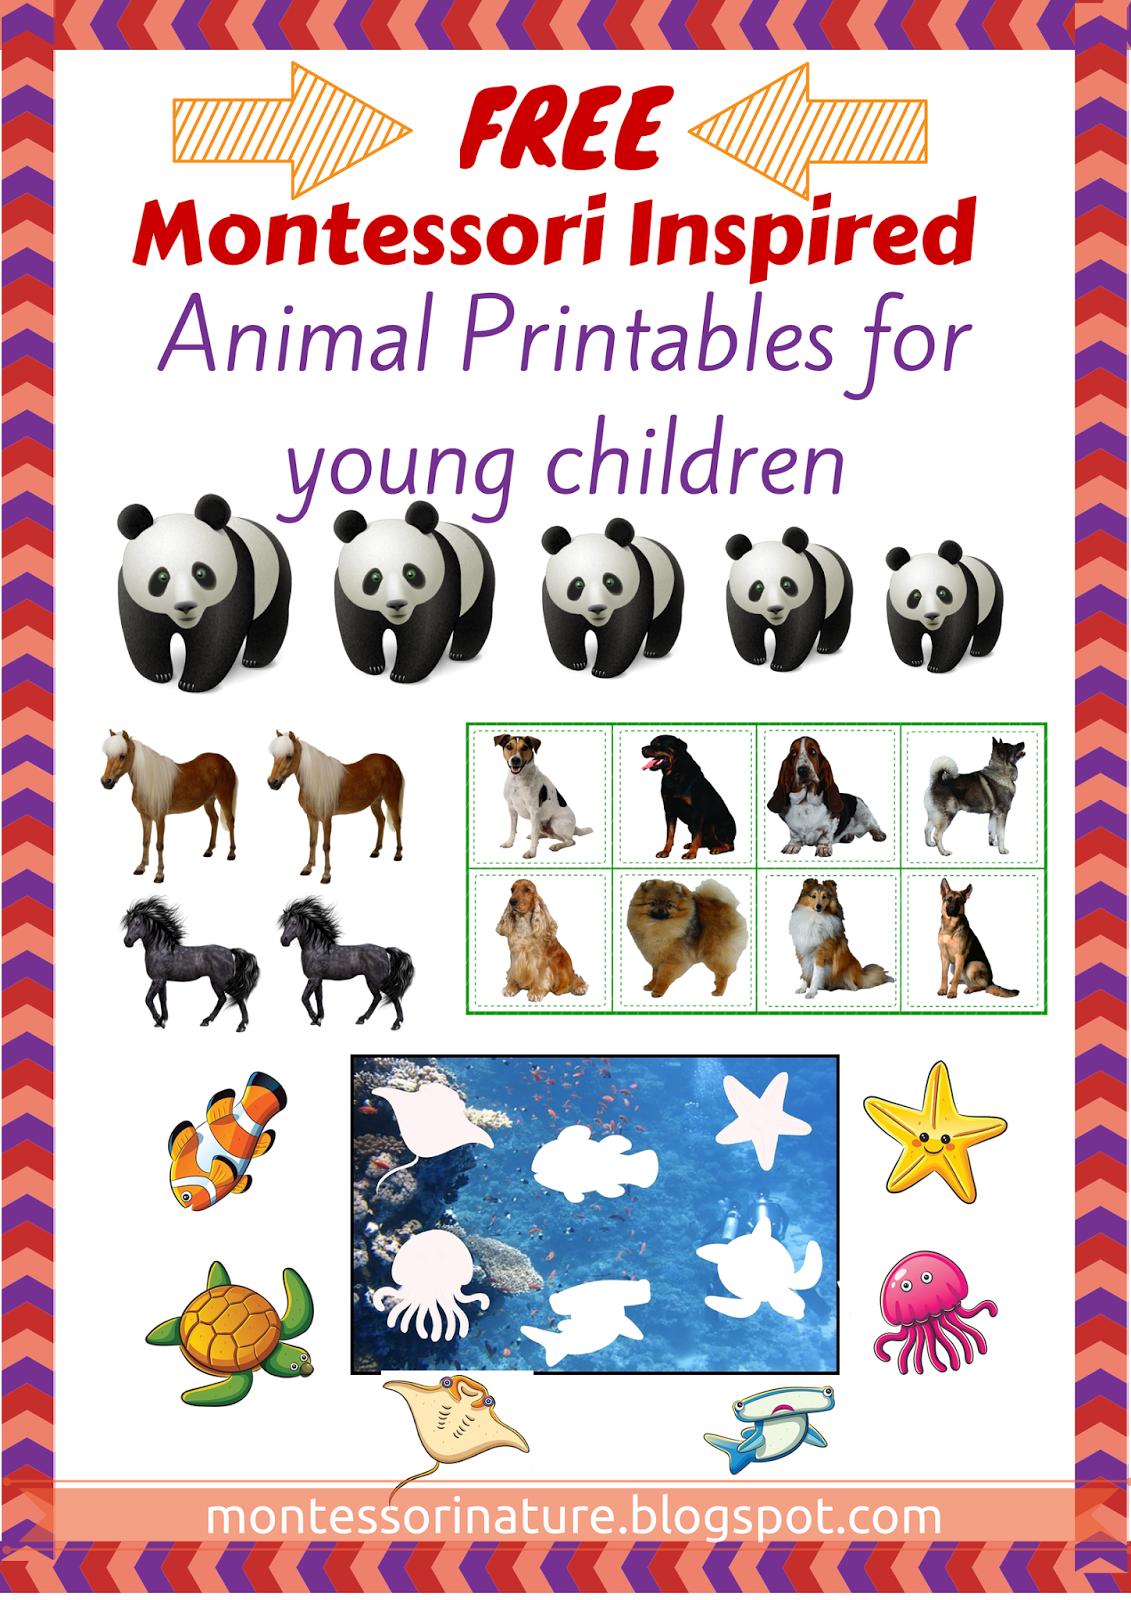 Montessori Nature Montessori Printables